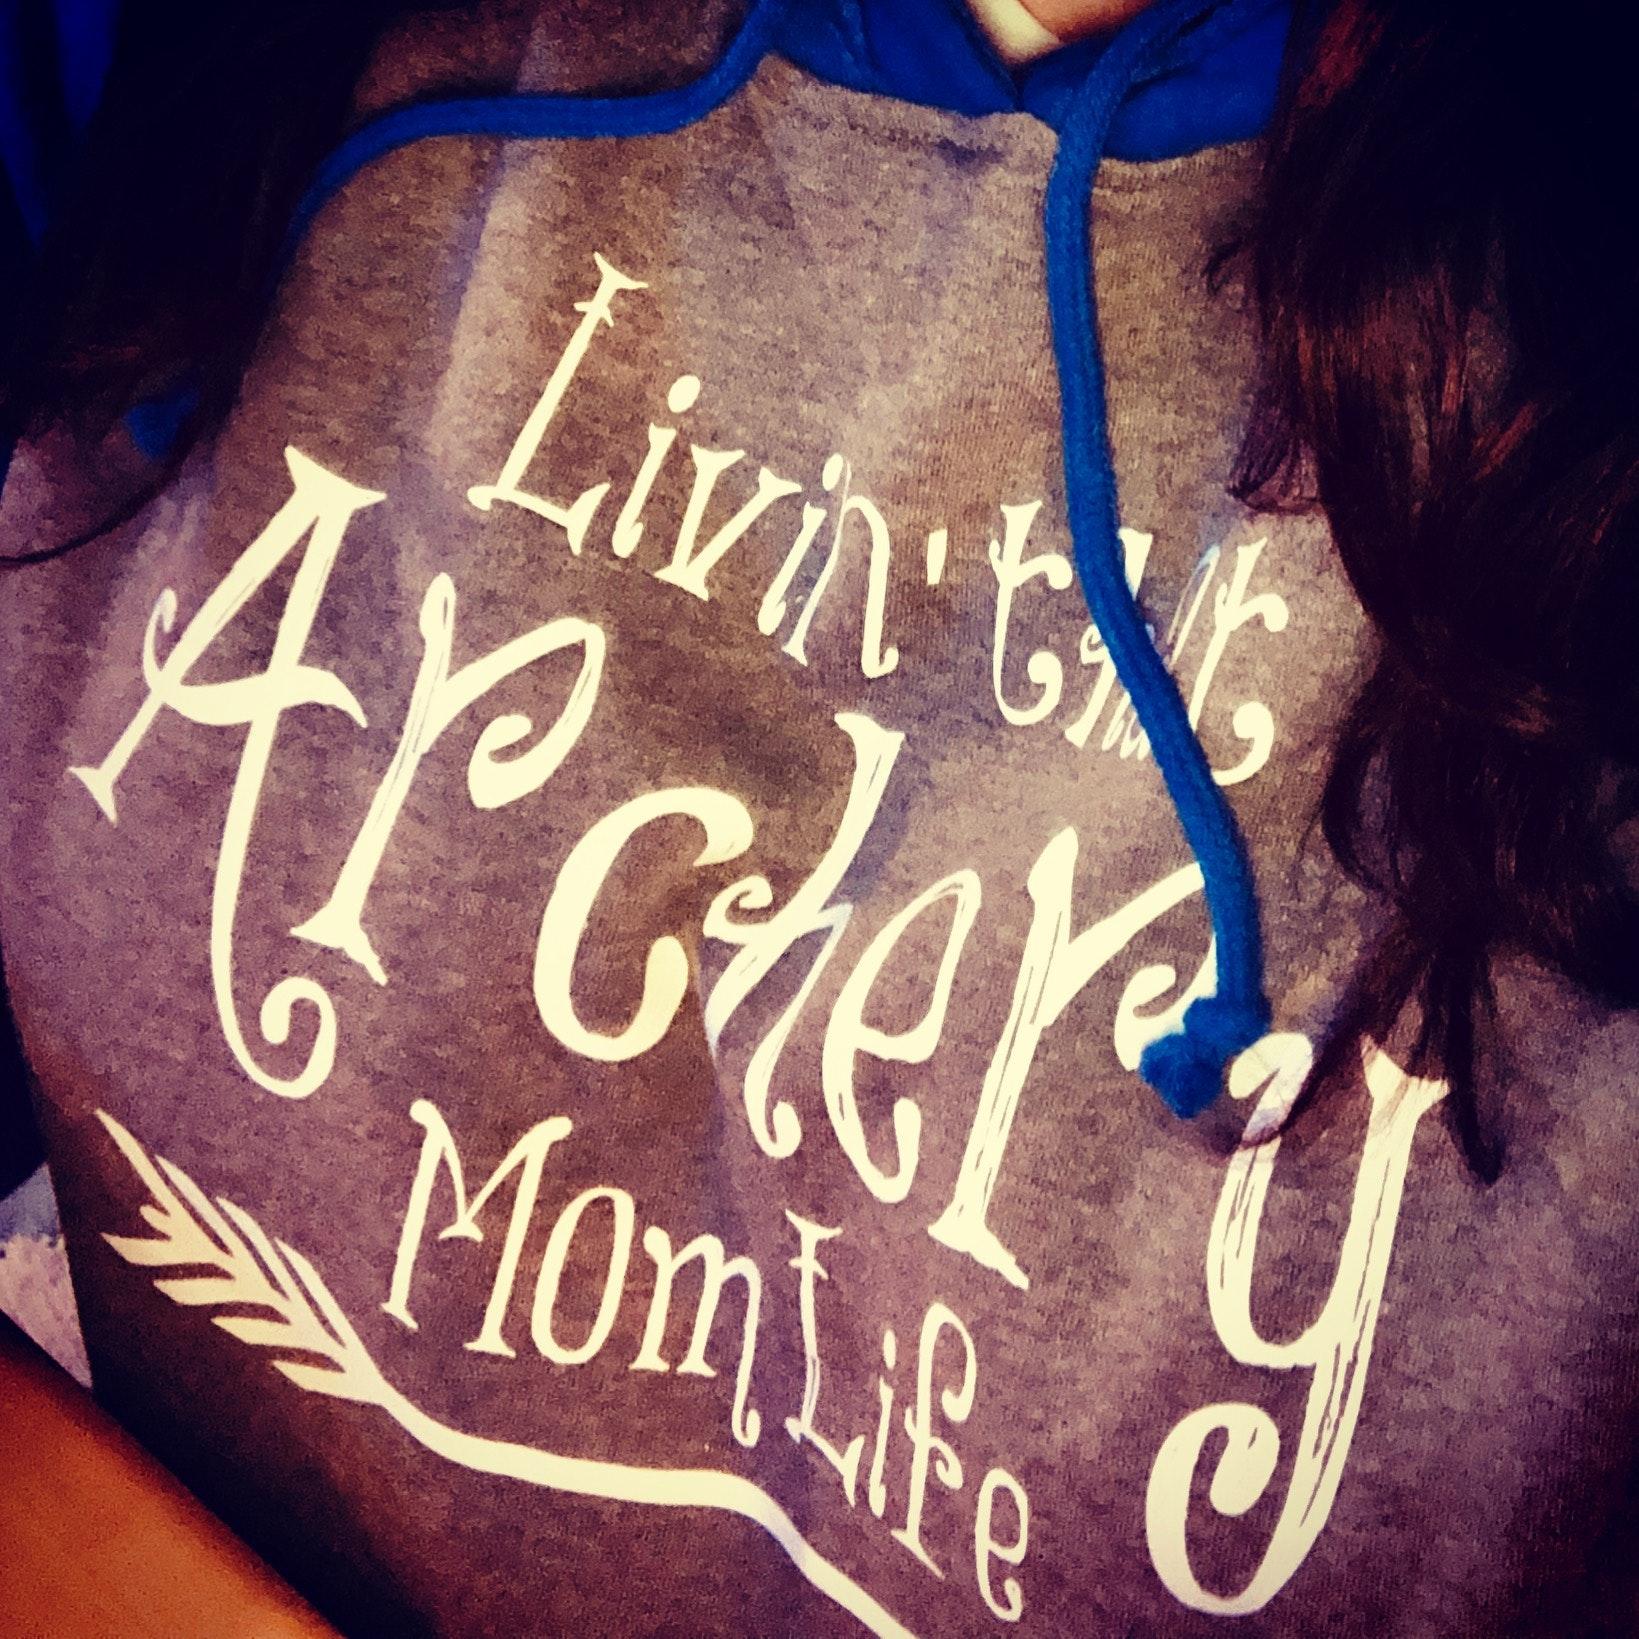 J America JA8885 customer review by  I love my new hoodie!